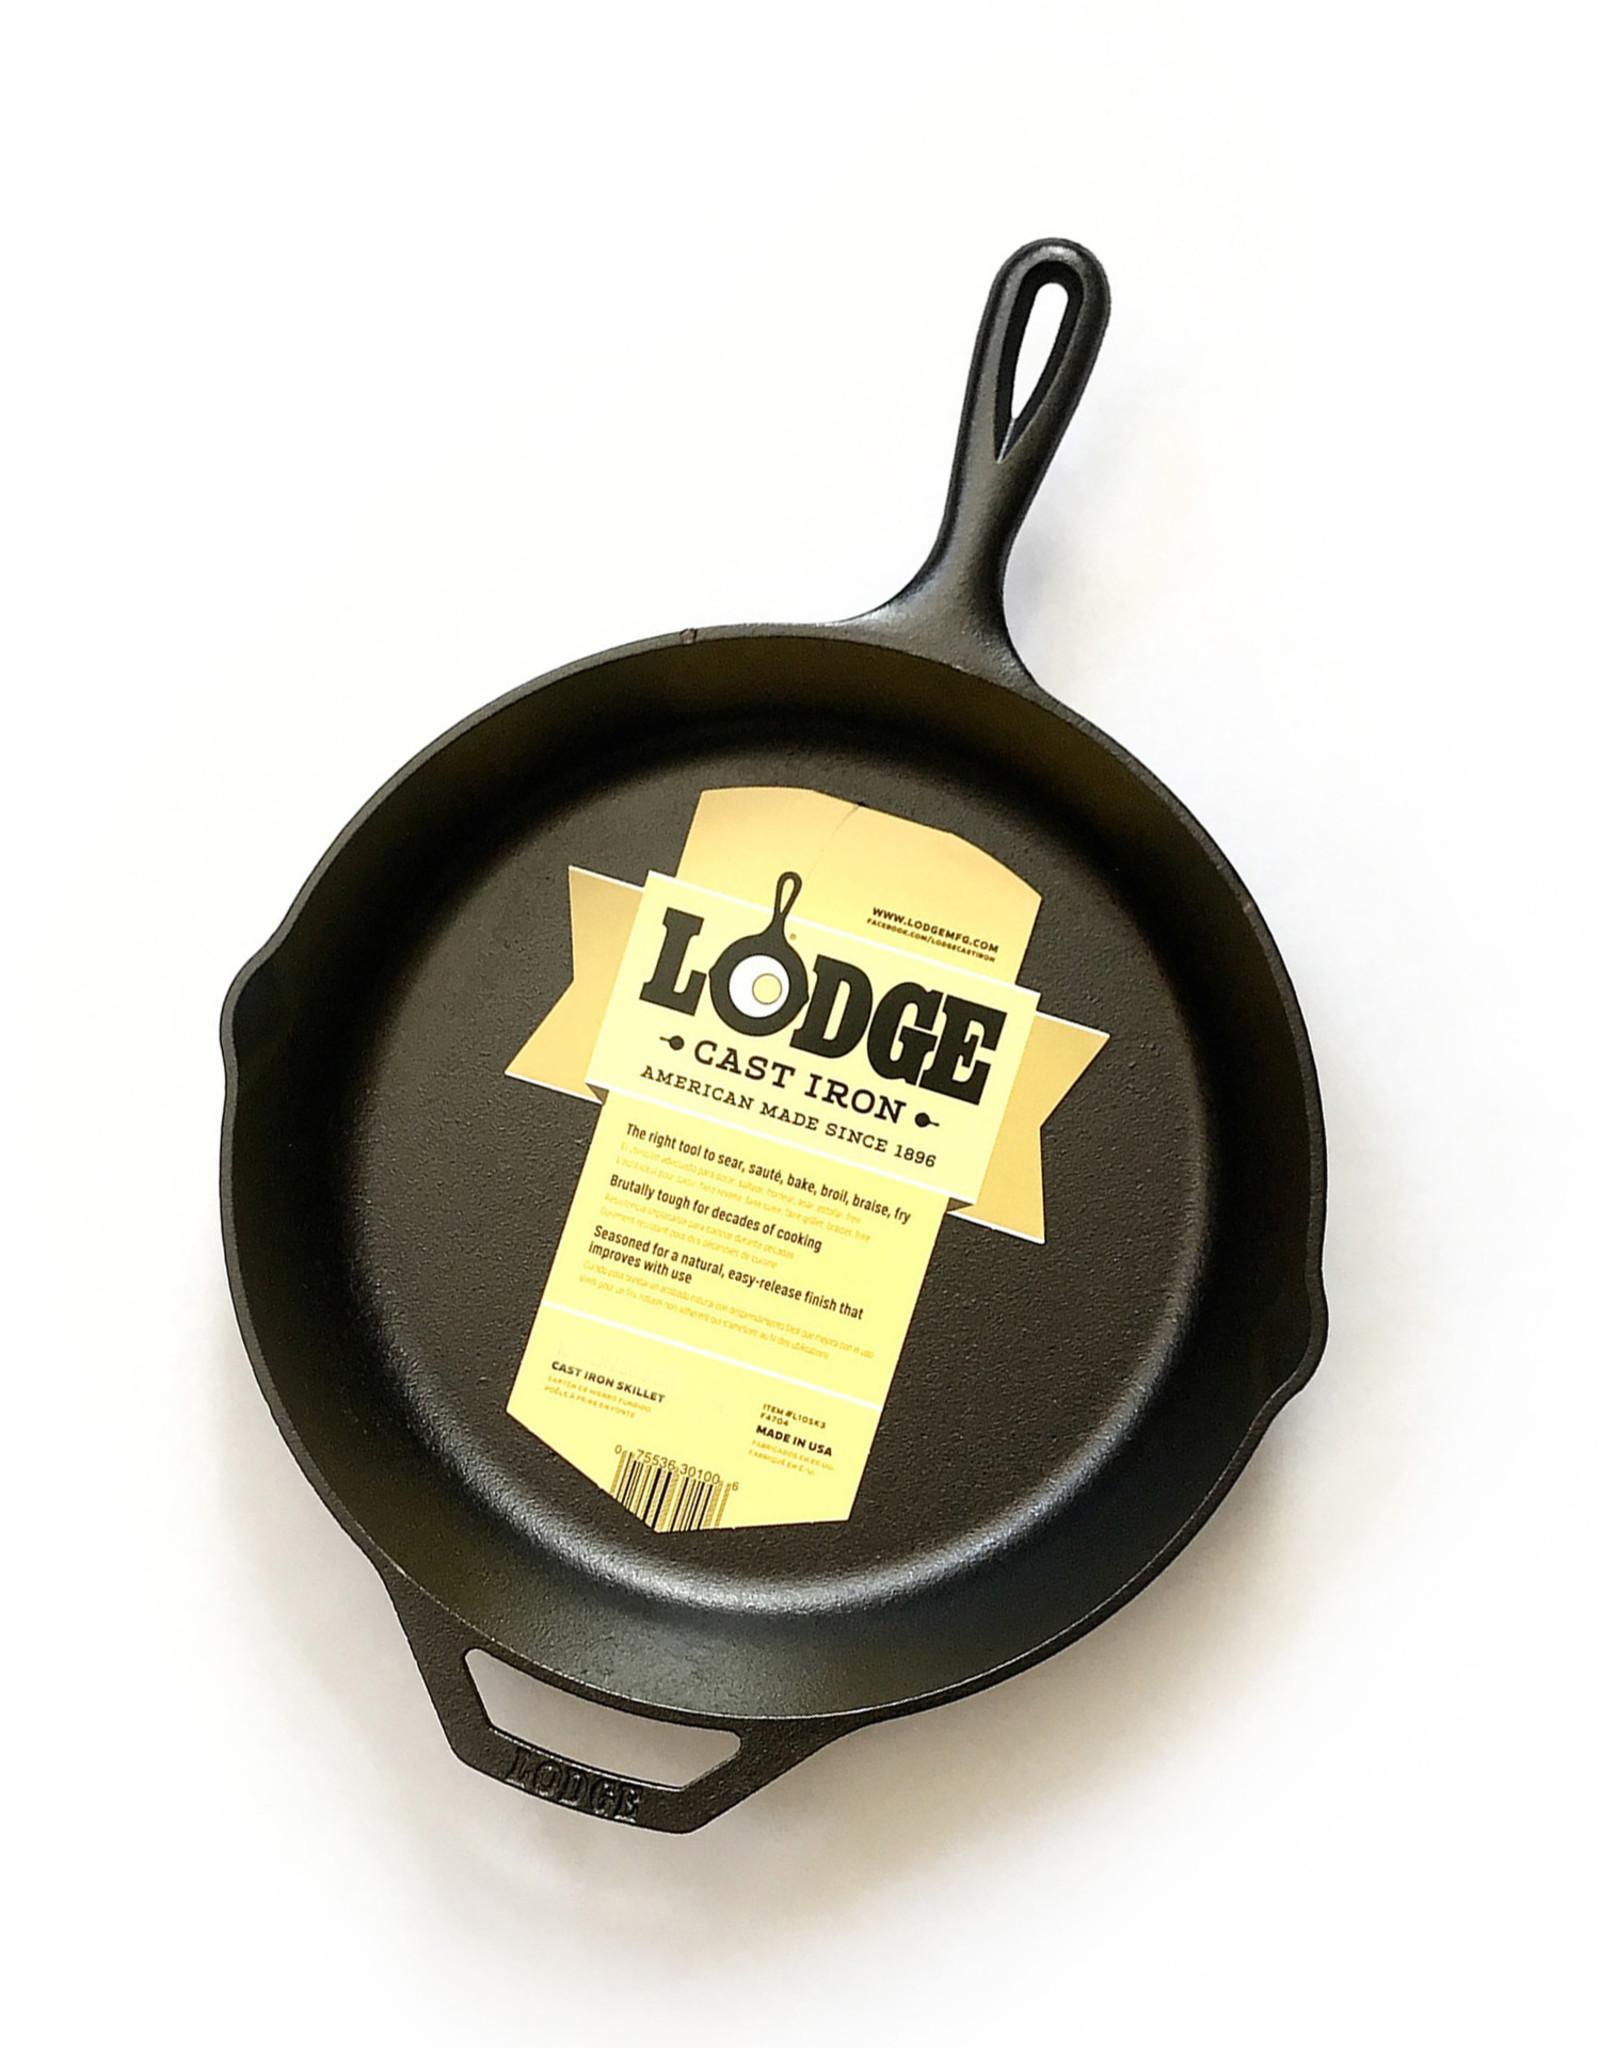 Lodge Lodge Cast Iron Skillets